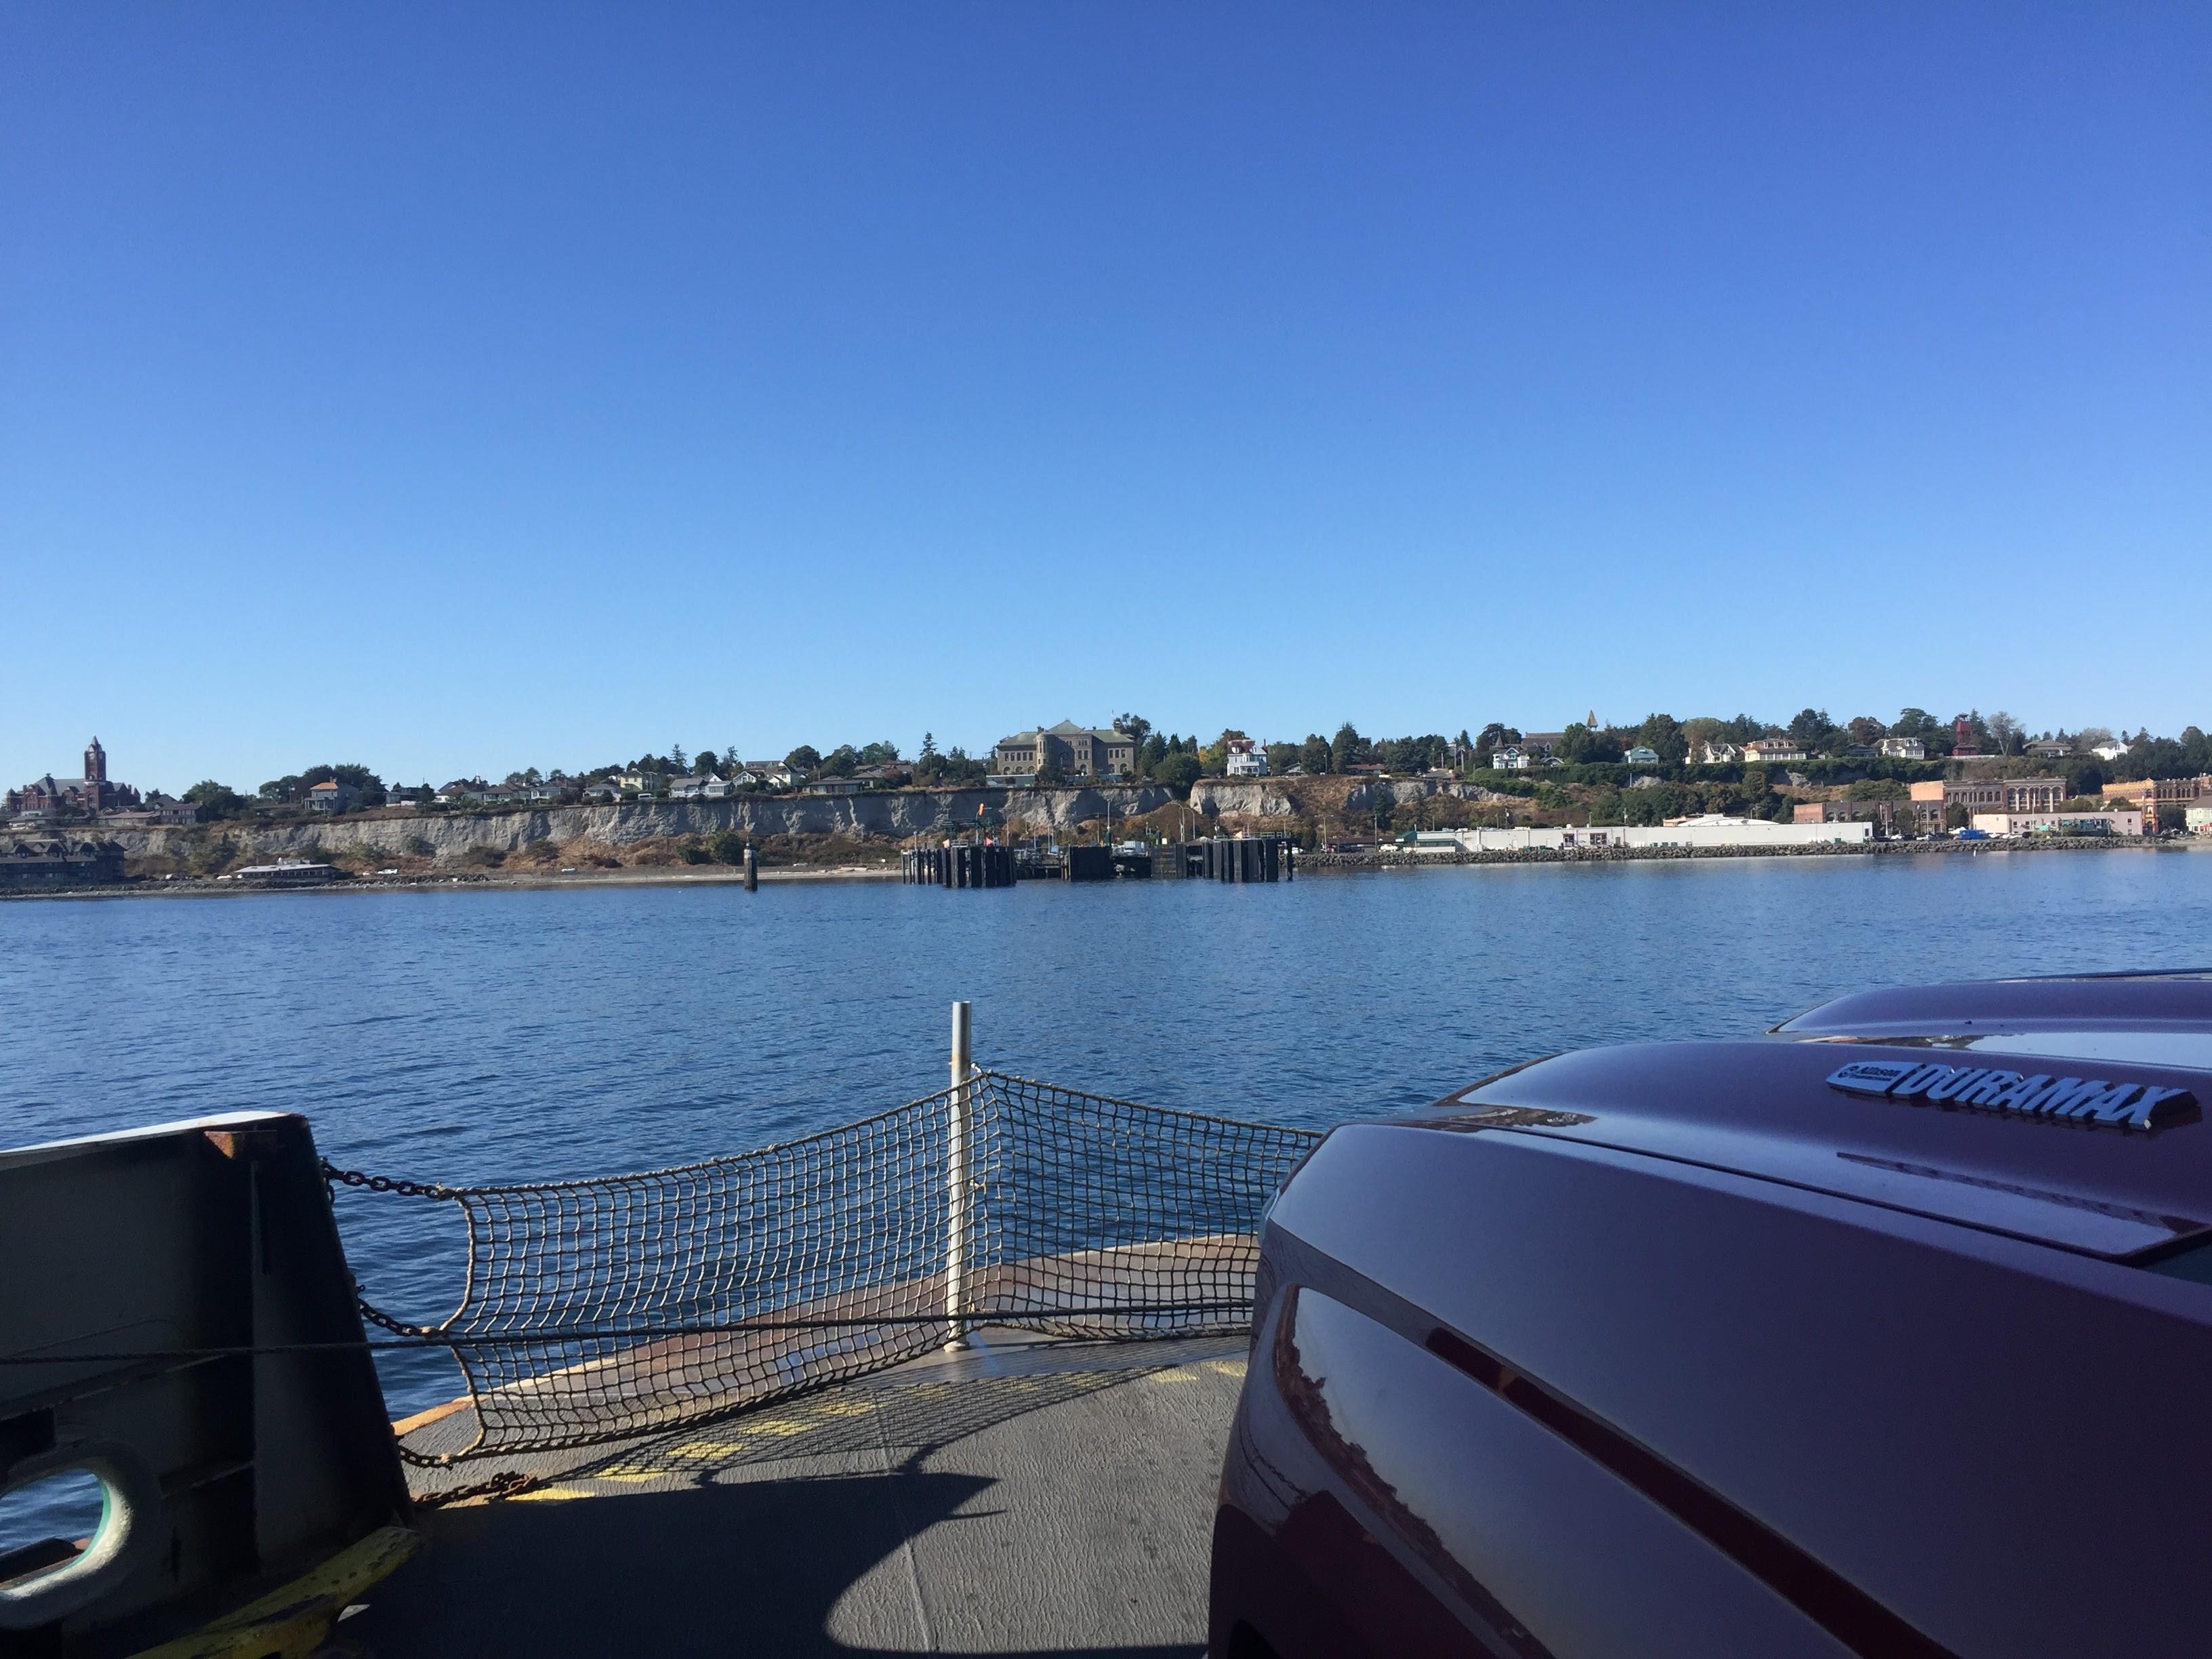 2017-09-28 Washington 01 Ferry 07